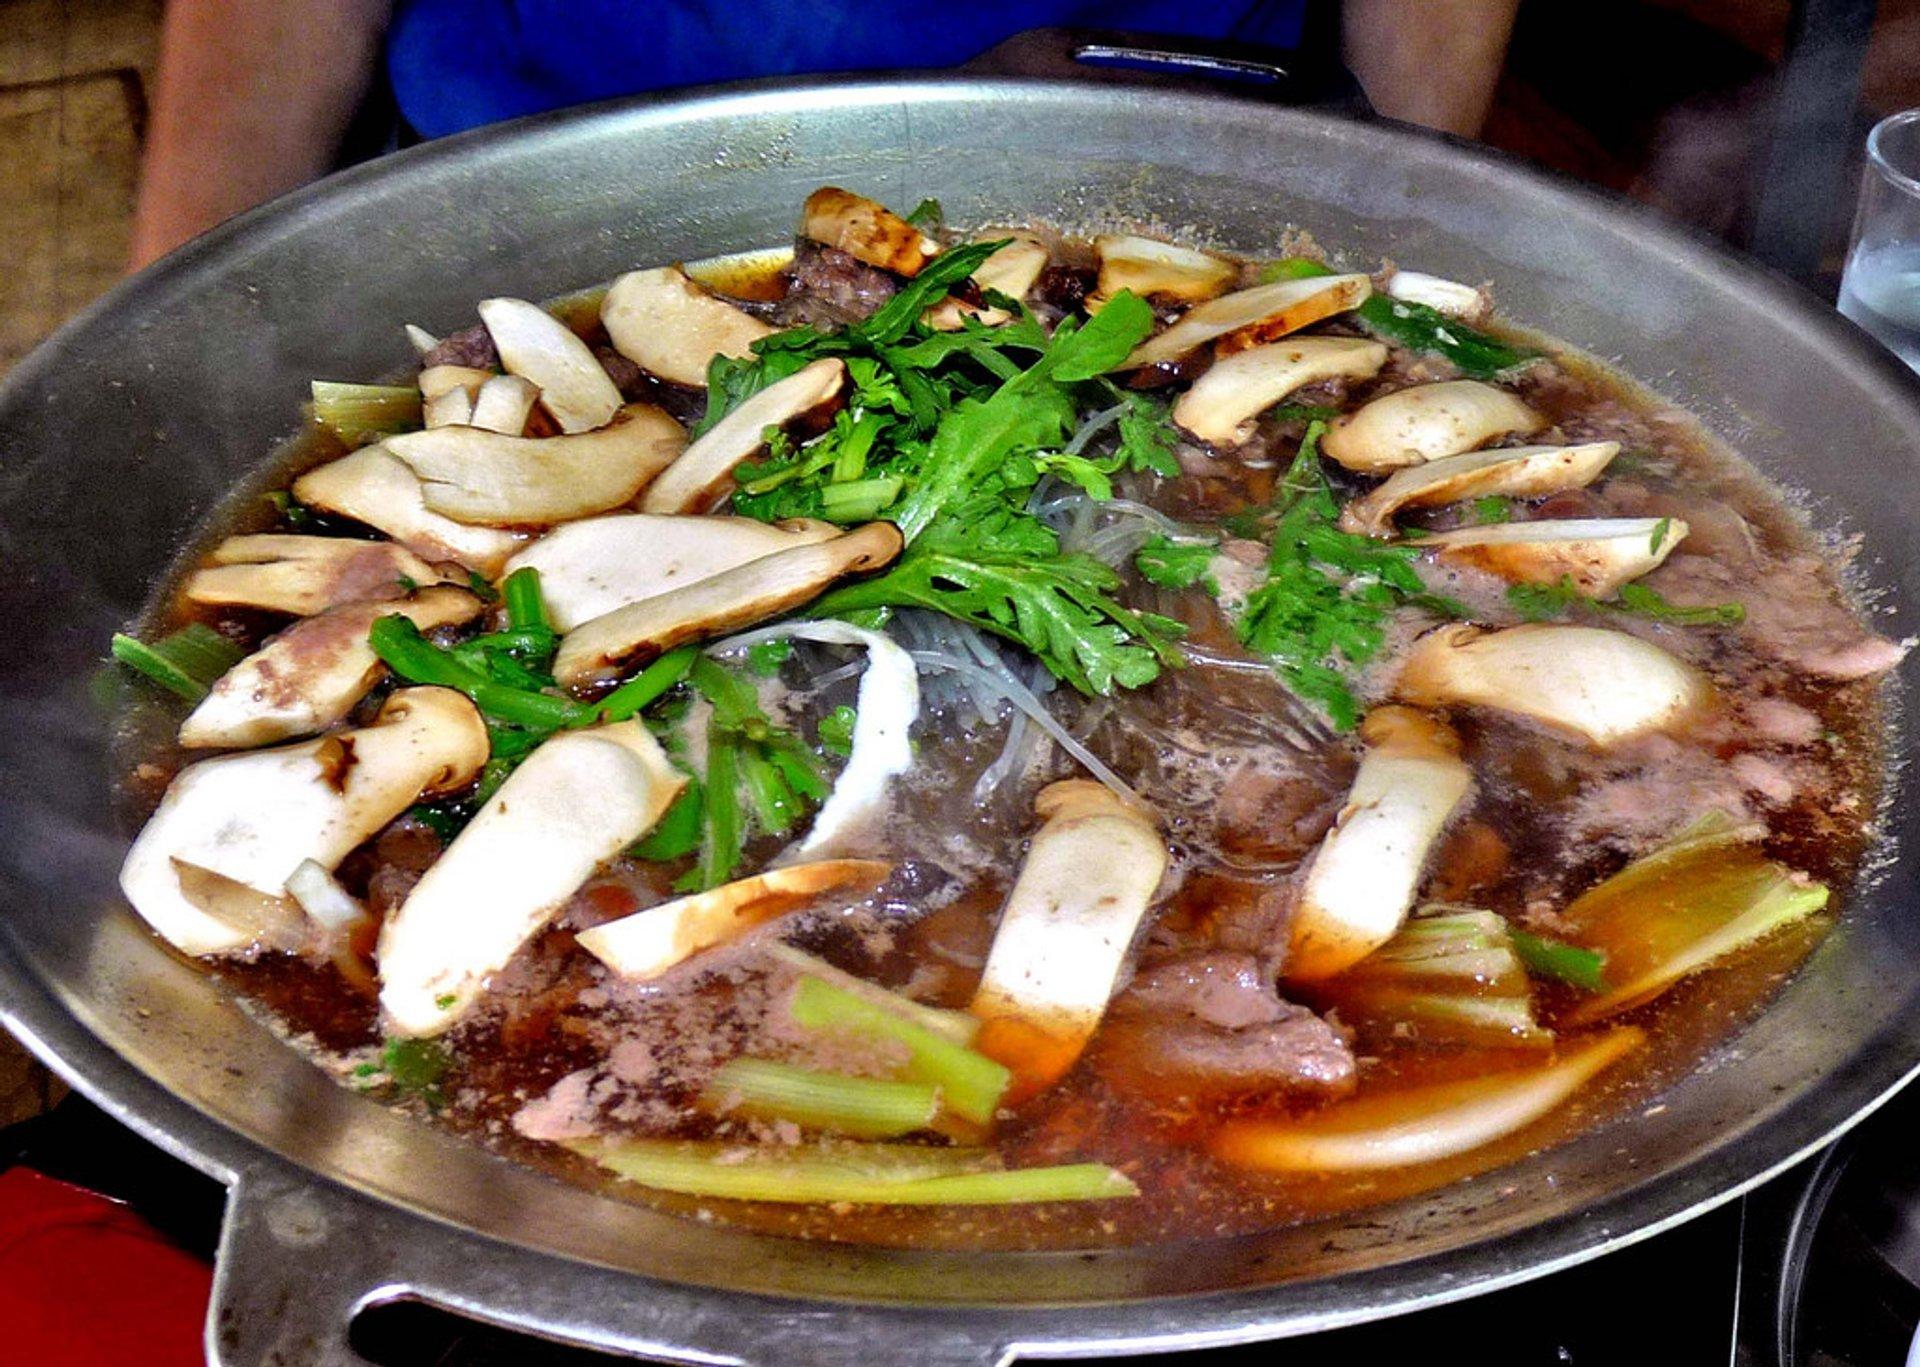 Pine Mushrooms (Songi) in South Korea 2020 - Best Time